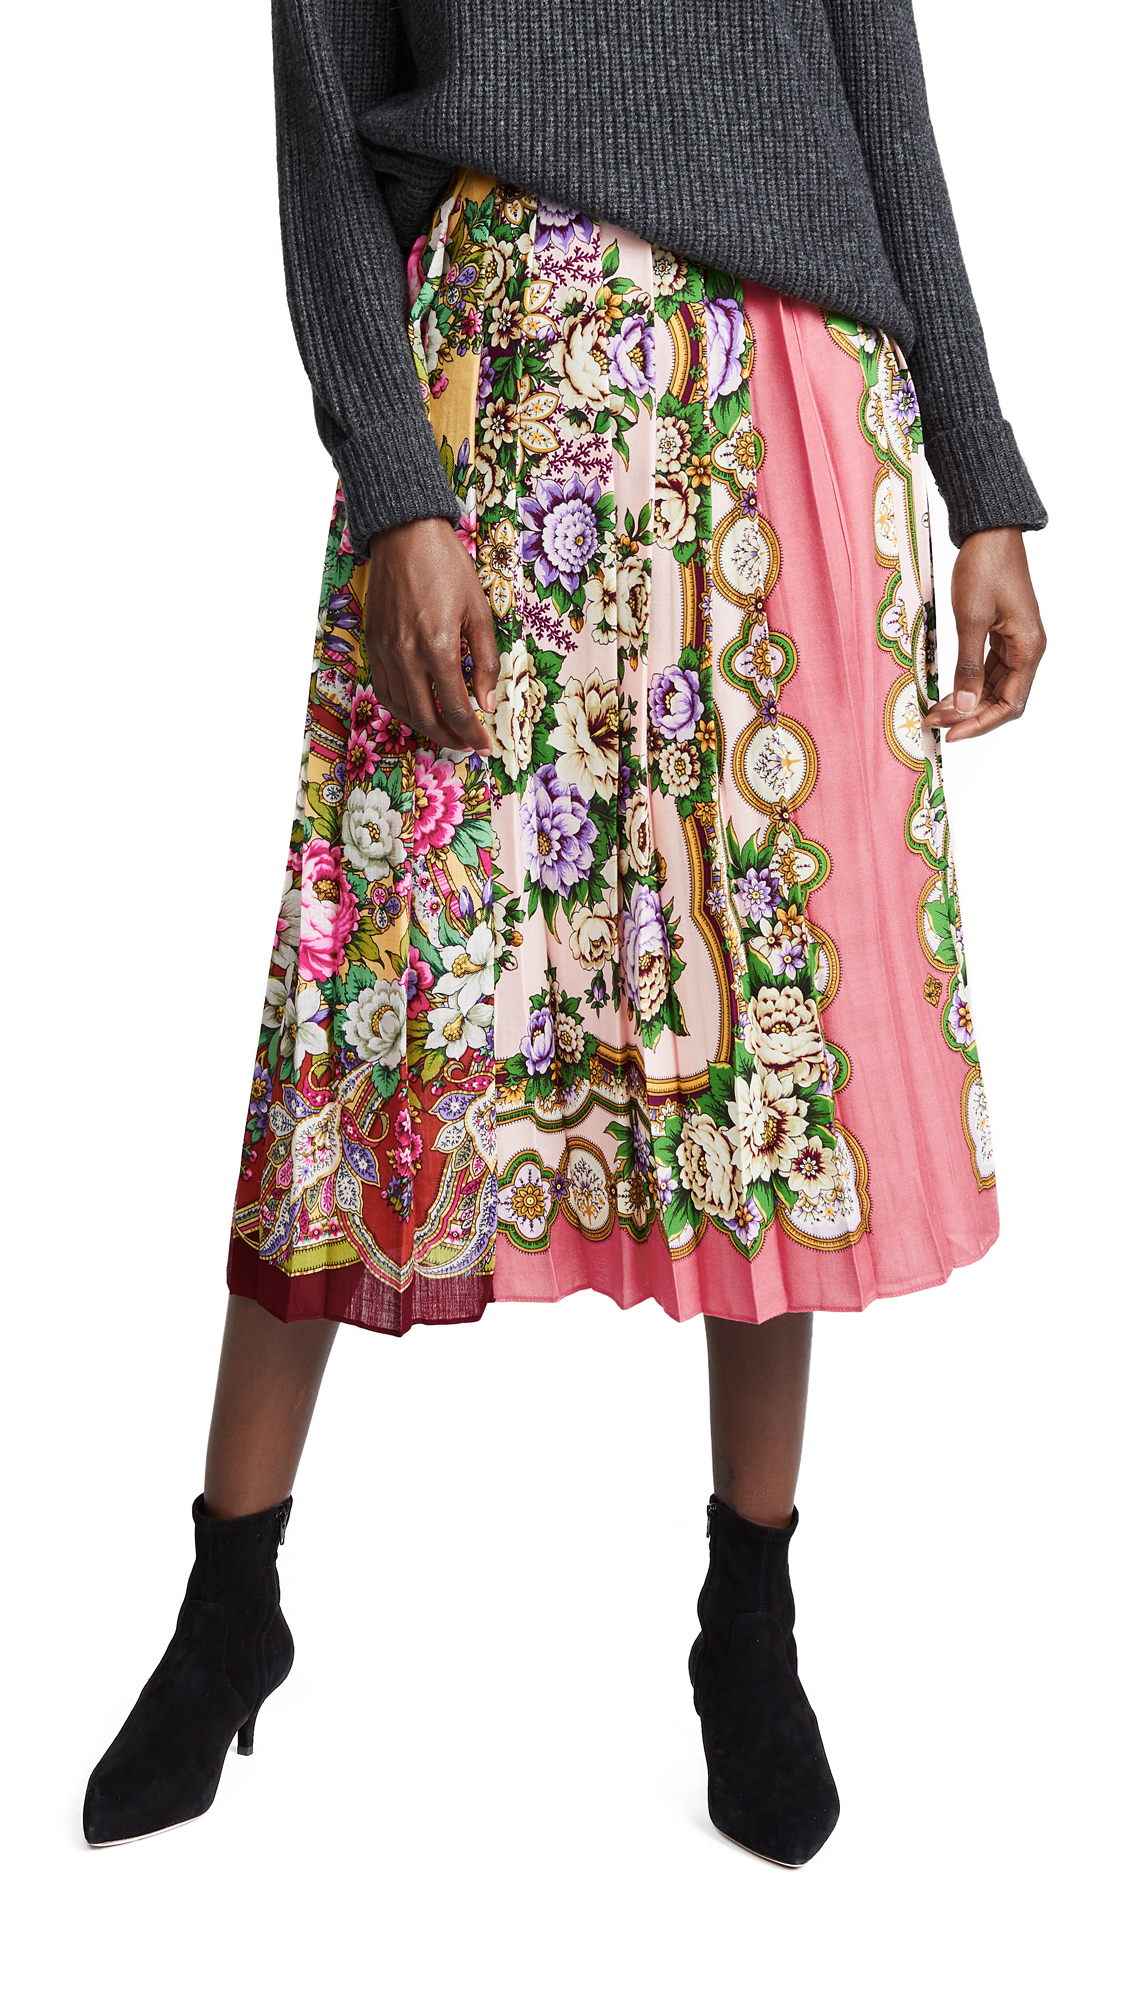 Tata Naka Box Pleat Skirt In Floral